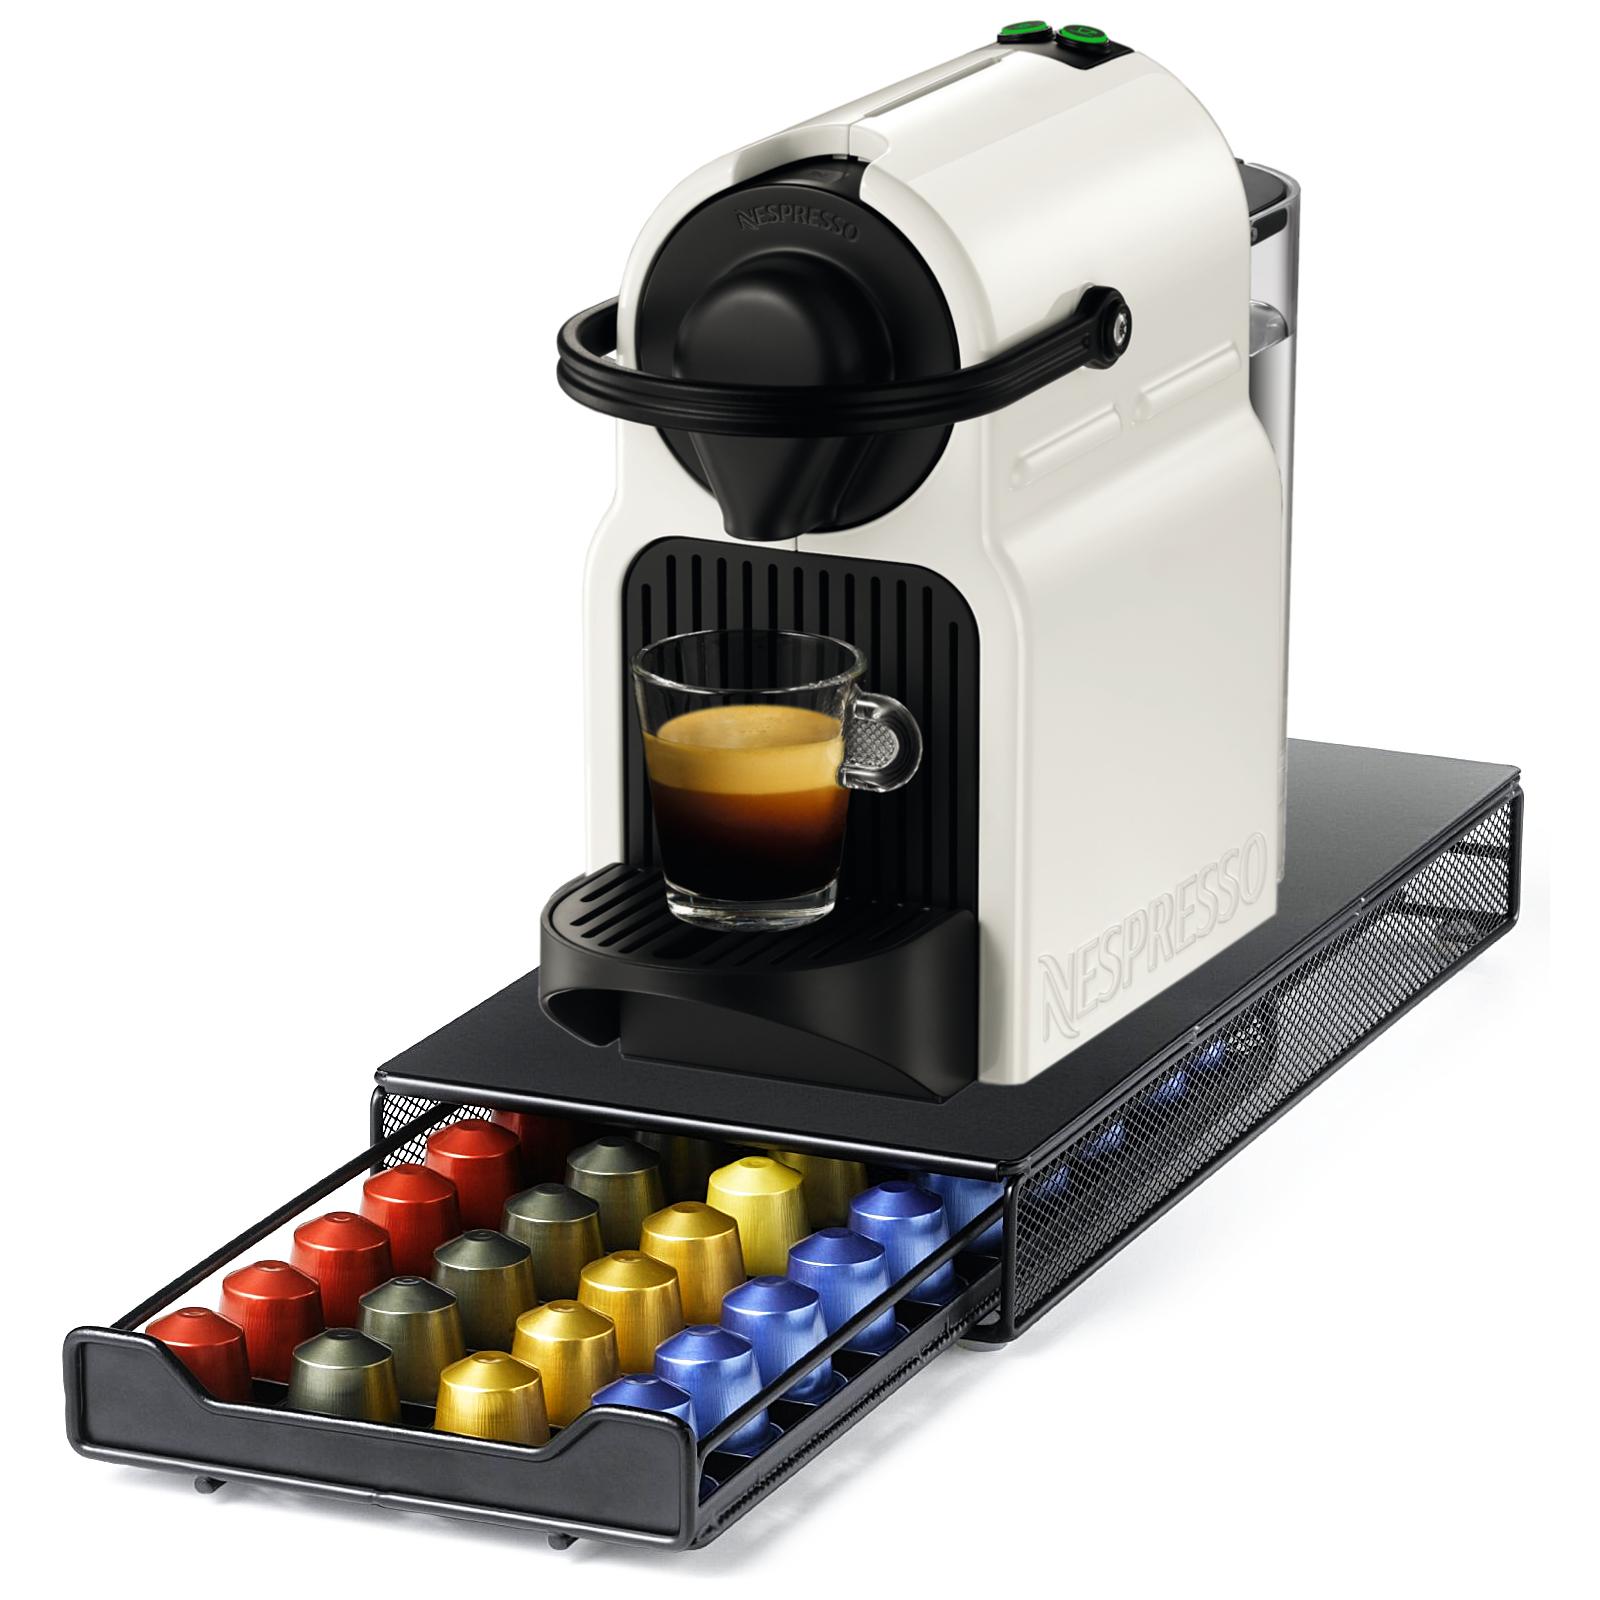 Nespresso Original Line Inissia C40 White Espresso Maker with Bonus 40 Capsule Storage Drawer